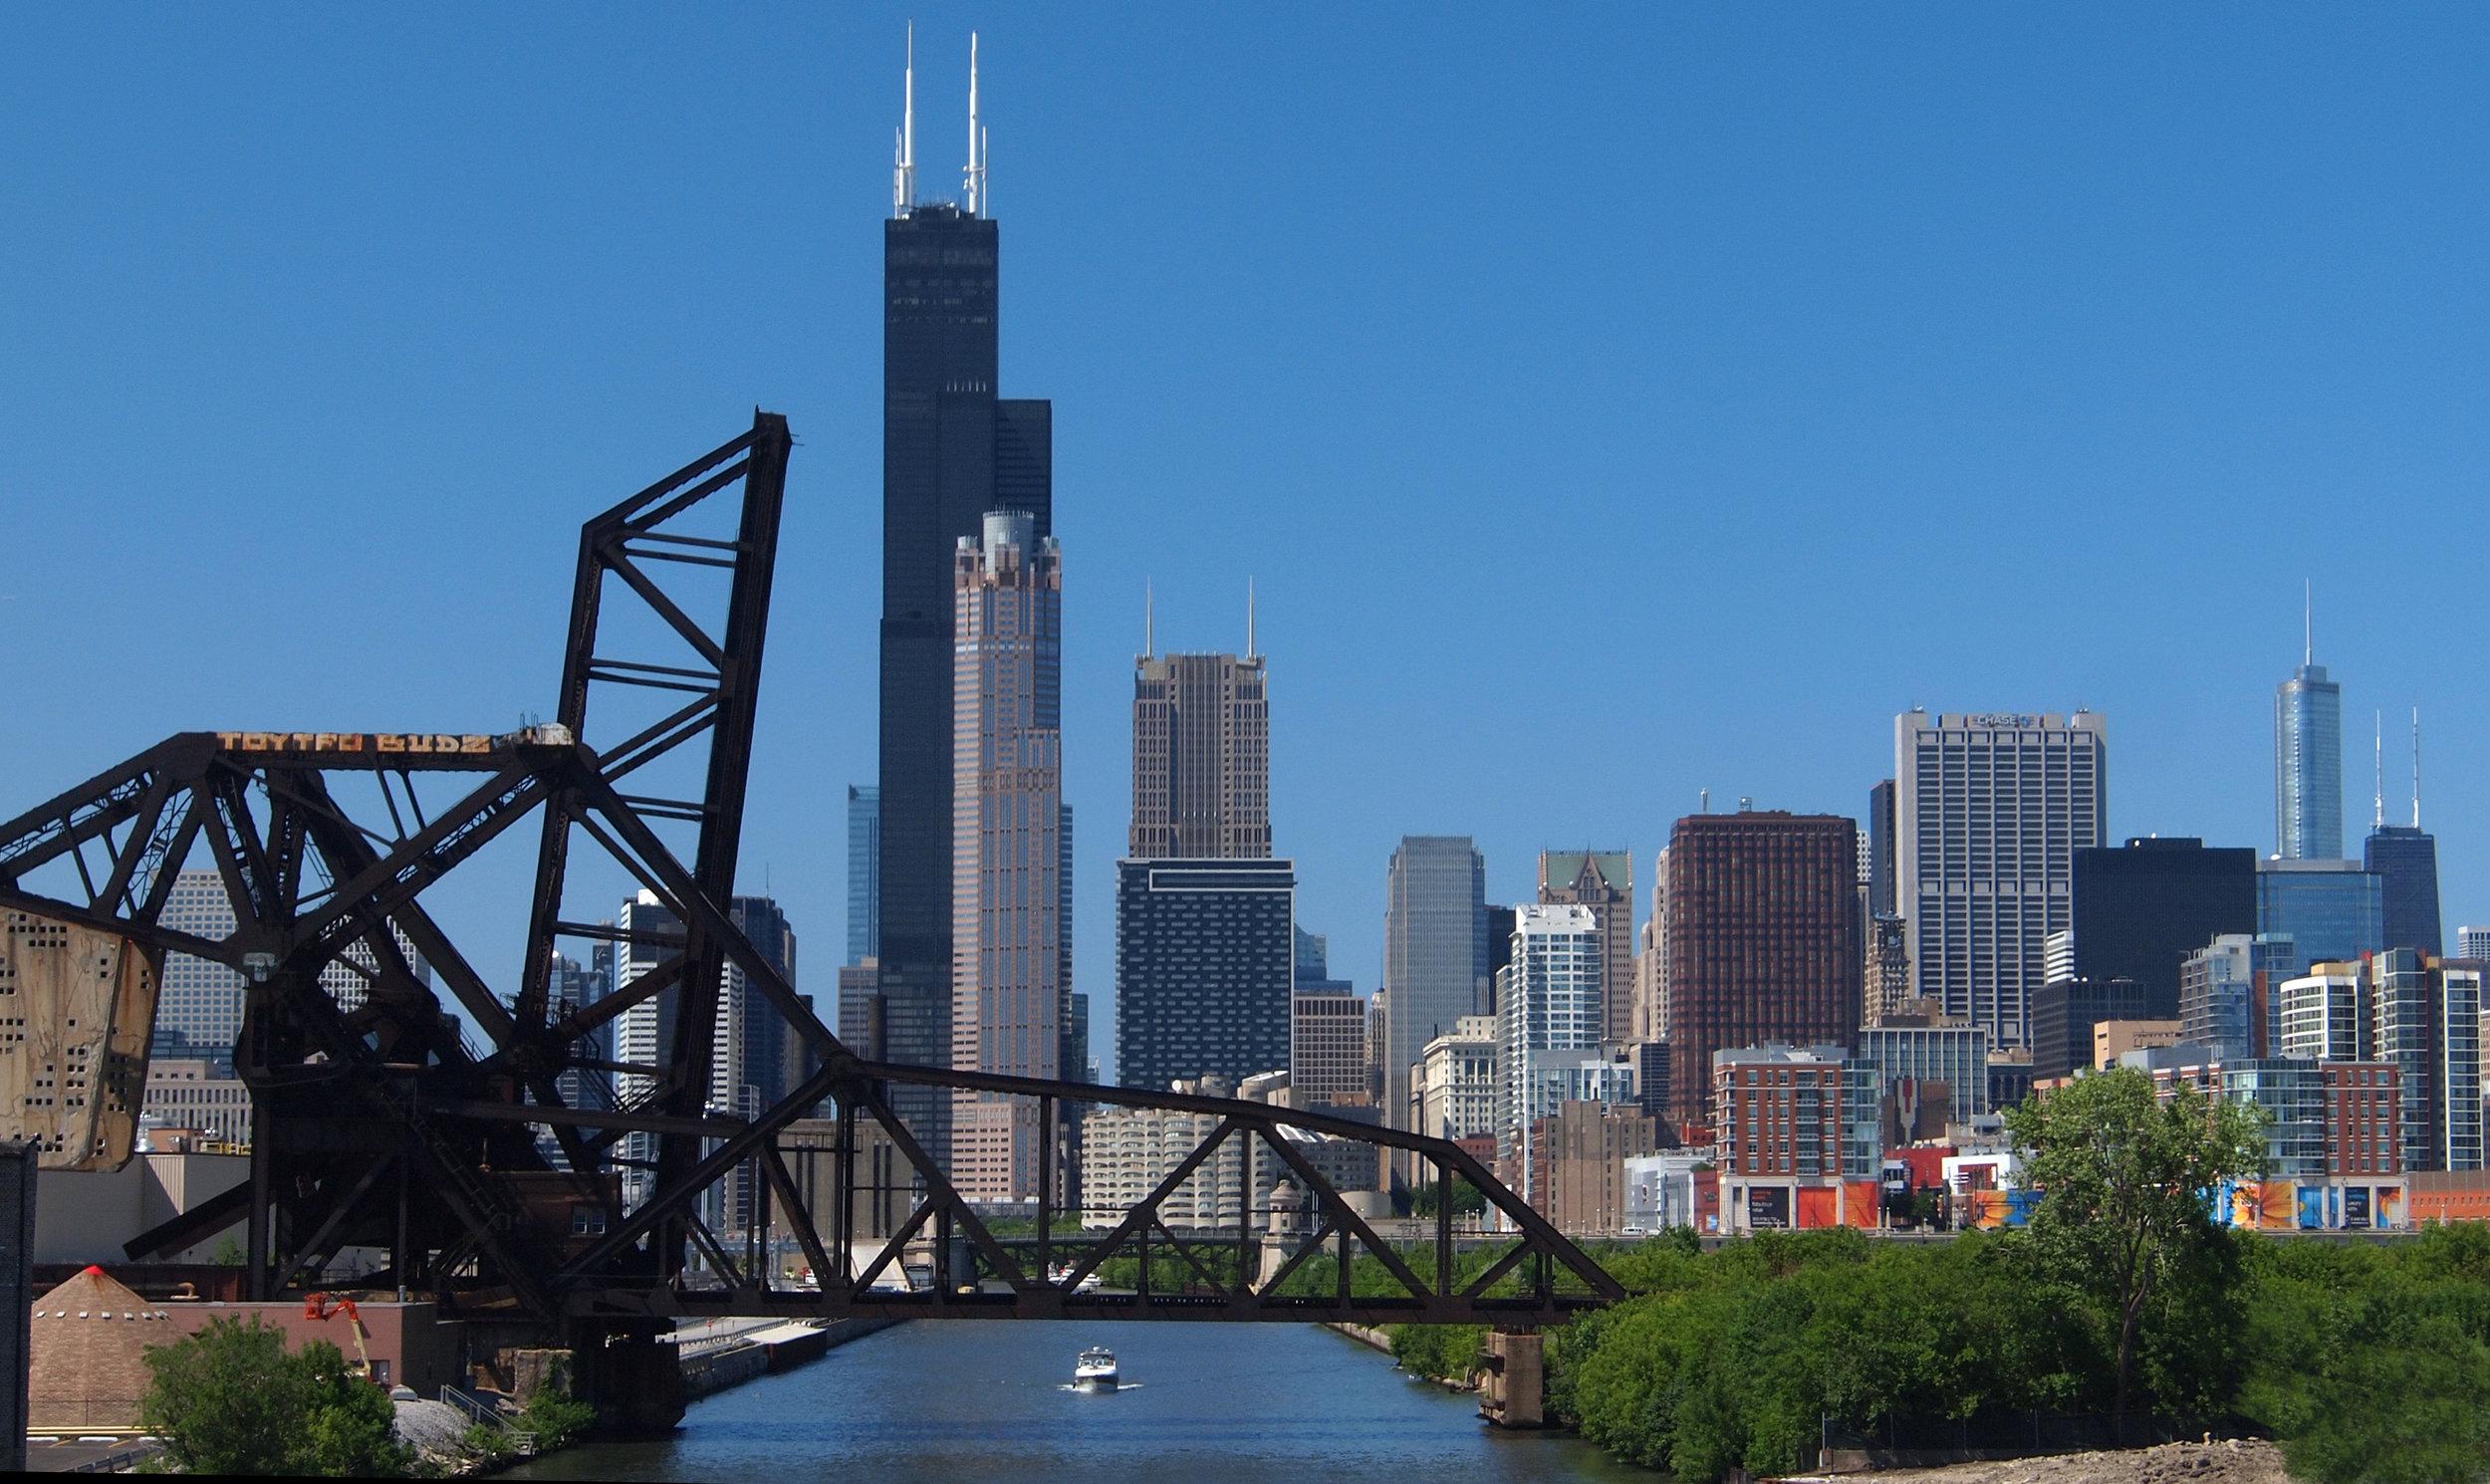 Chicago_skyline_from_16th_Street_bridge.jpg